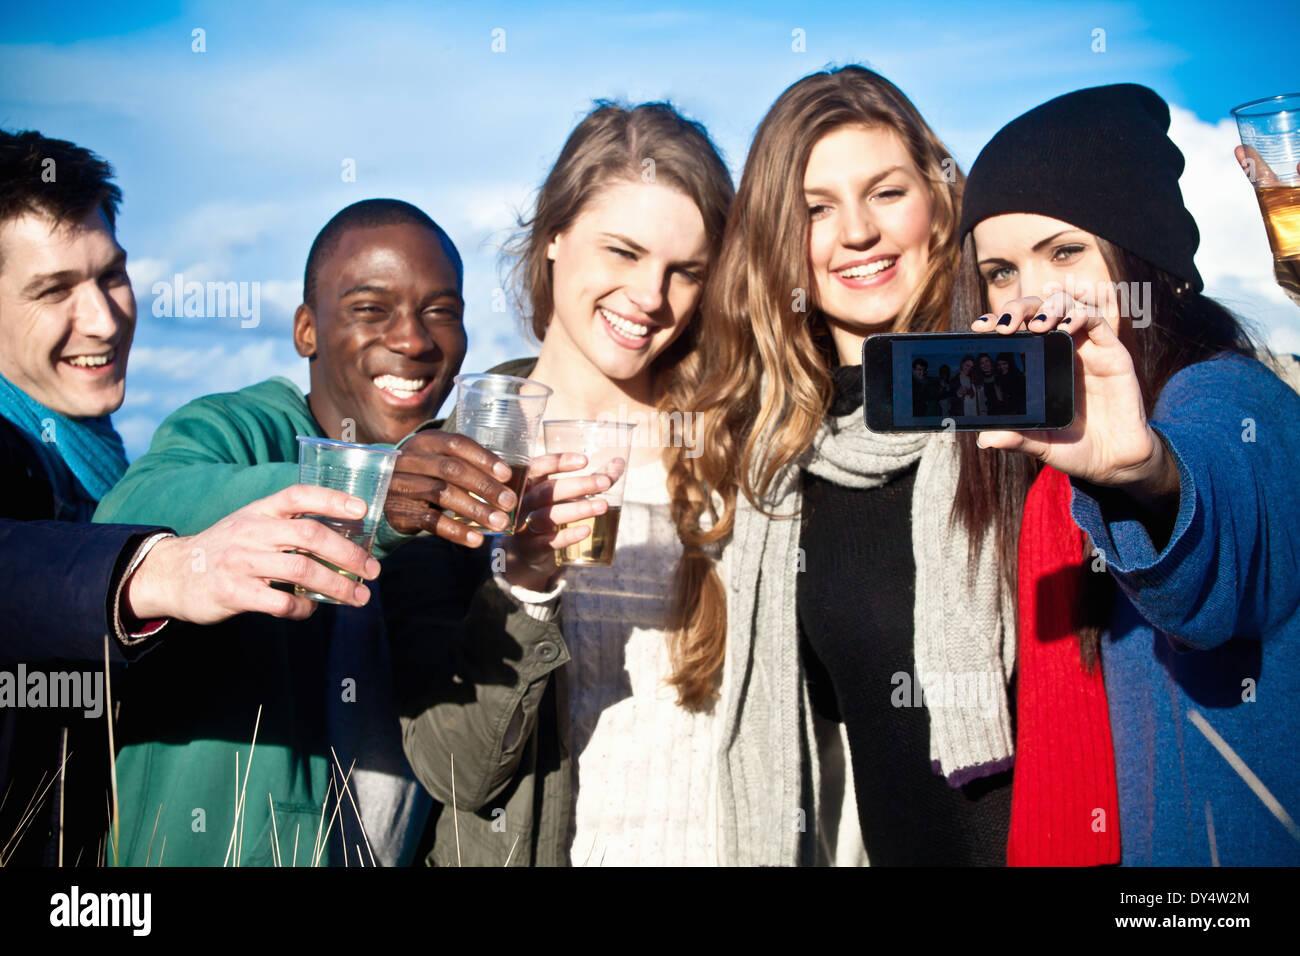 Young adult friends toasting avec vin blanc et en tenant selfies Photo Stock